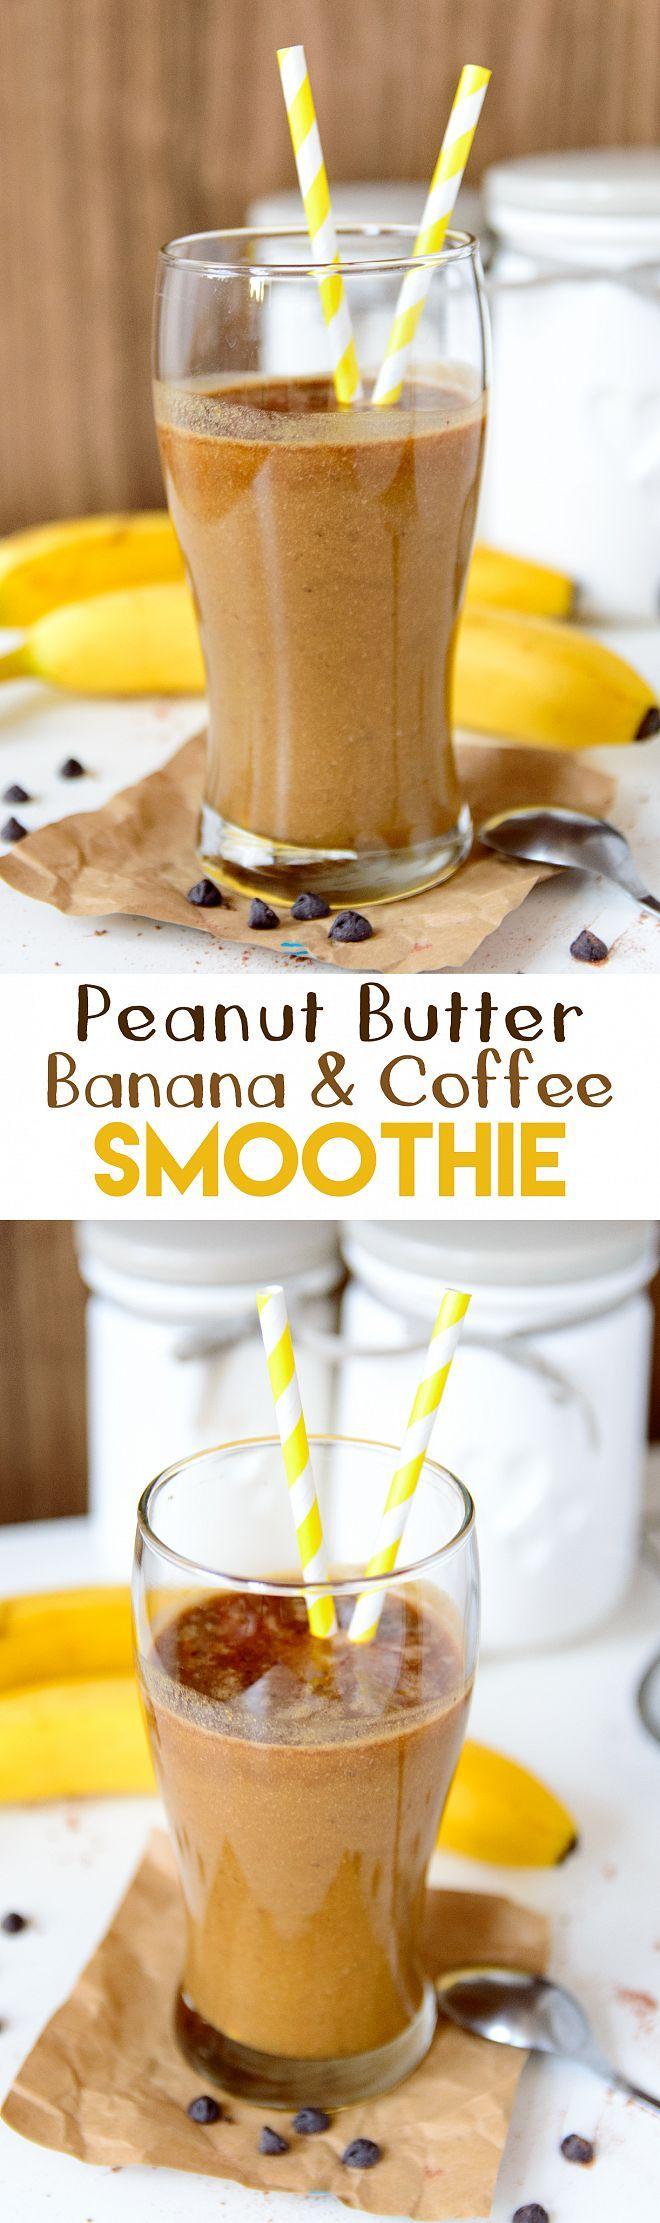 Peanut butter, banana and coffee smoothie {refined sugar free, GF, vegan-option} | myzucchinirecipes.com